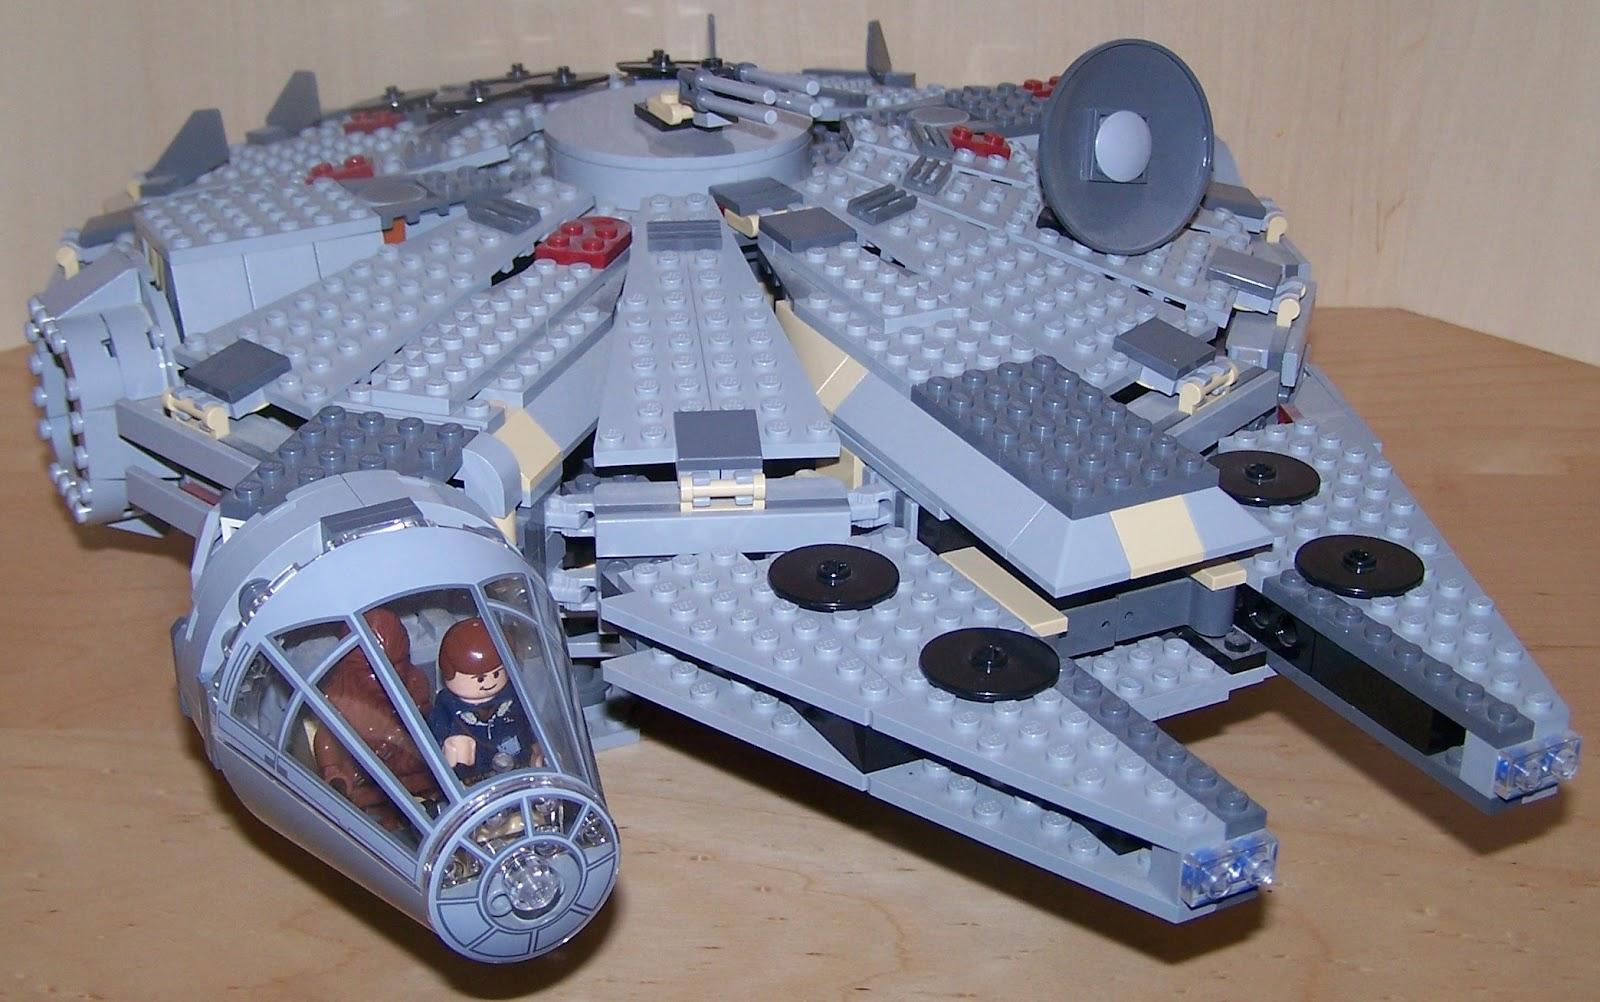 Lego Star Wars Millennium Falcon 2004 Lego millenium falcon